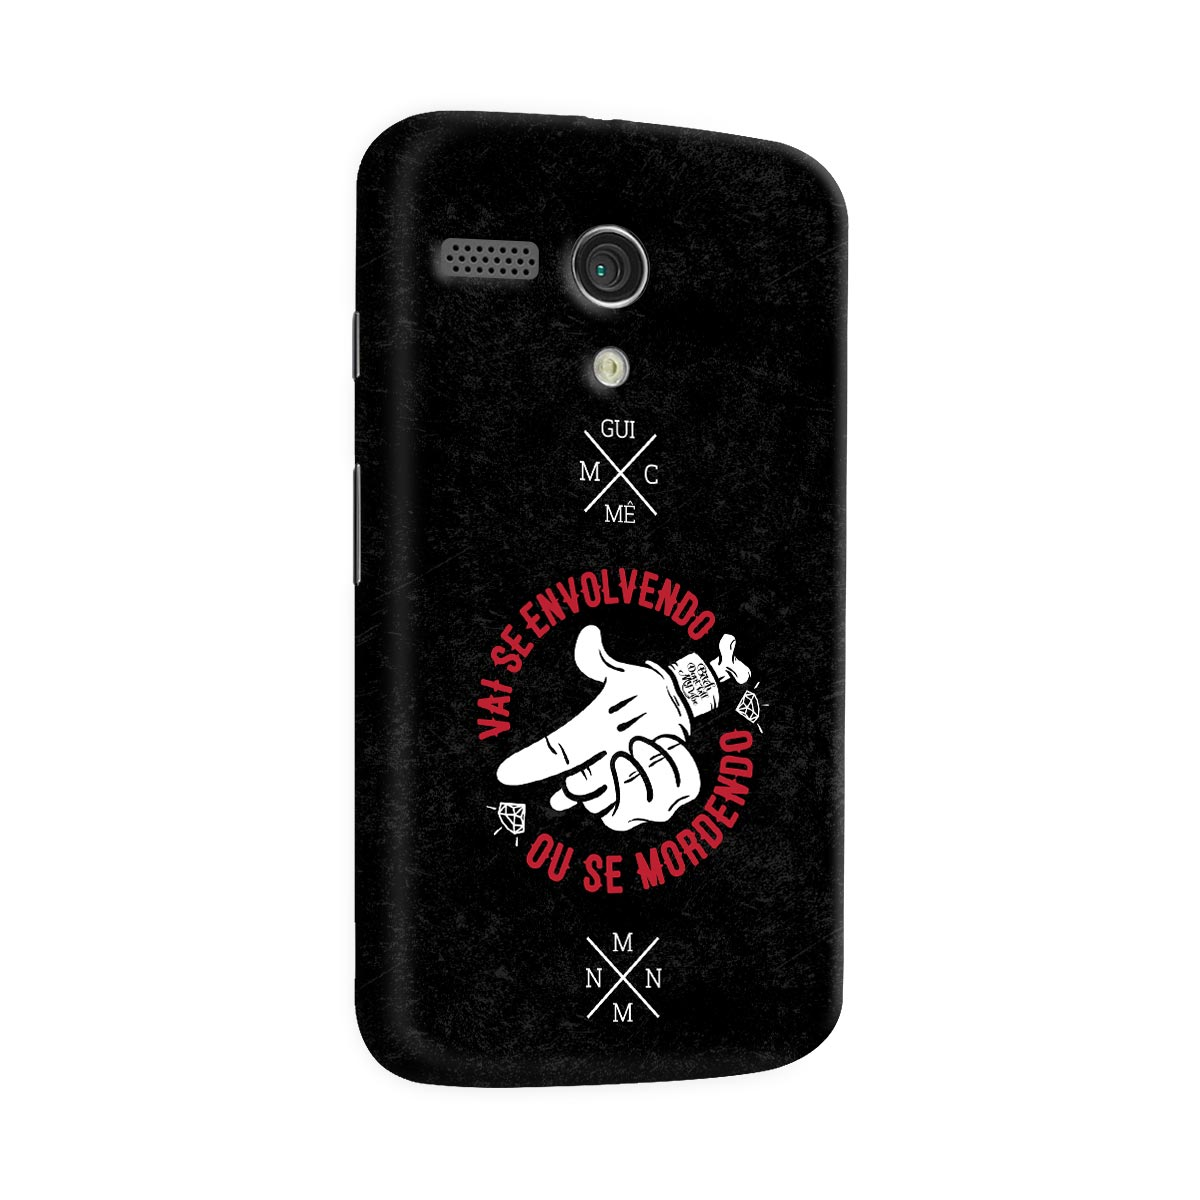 Capa para Motorola Moto G 1 MC Guimê Vai Se Envolvendo